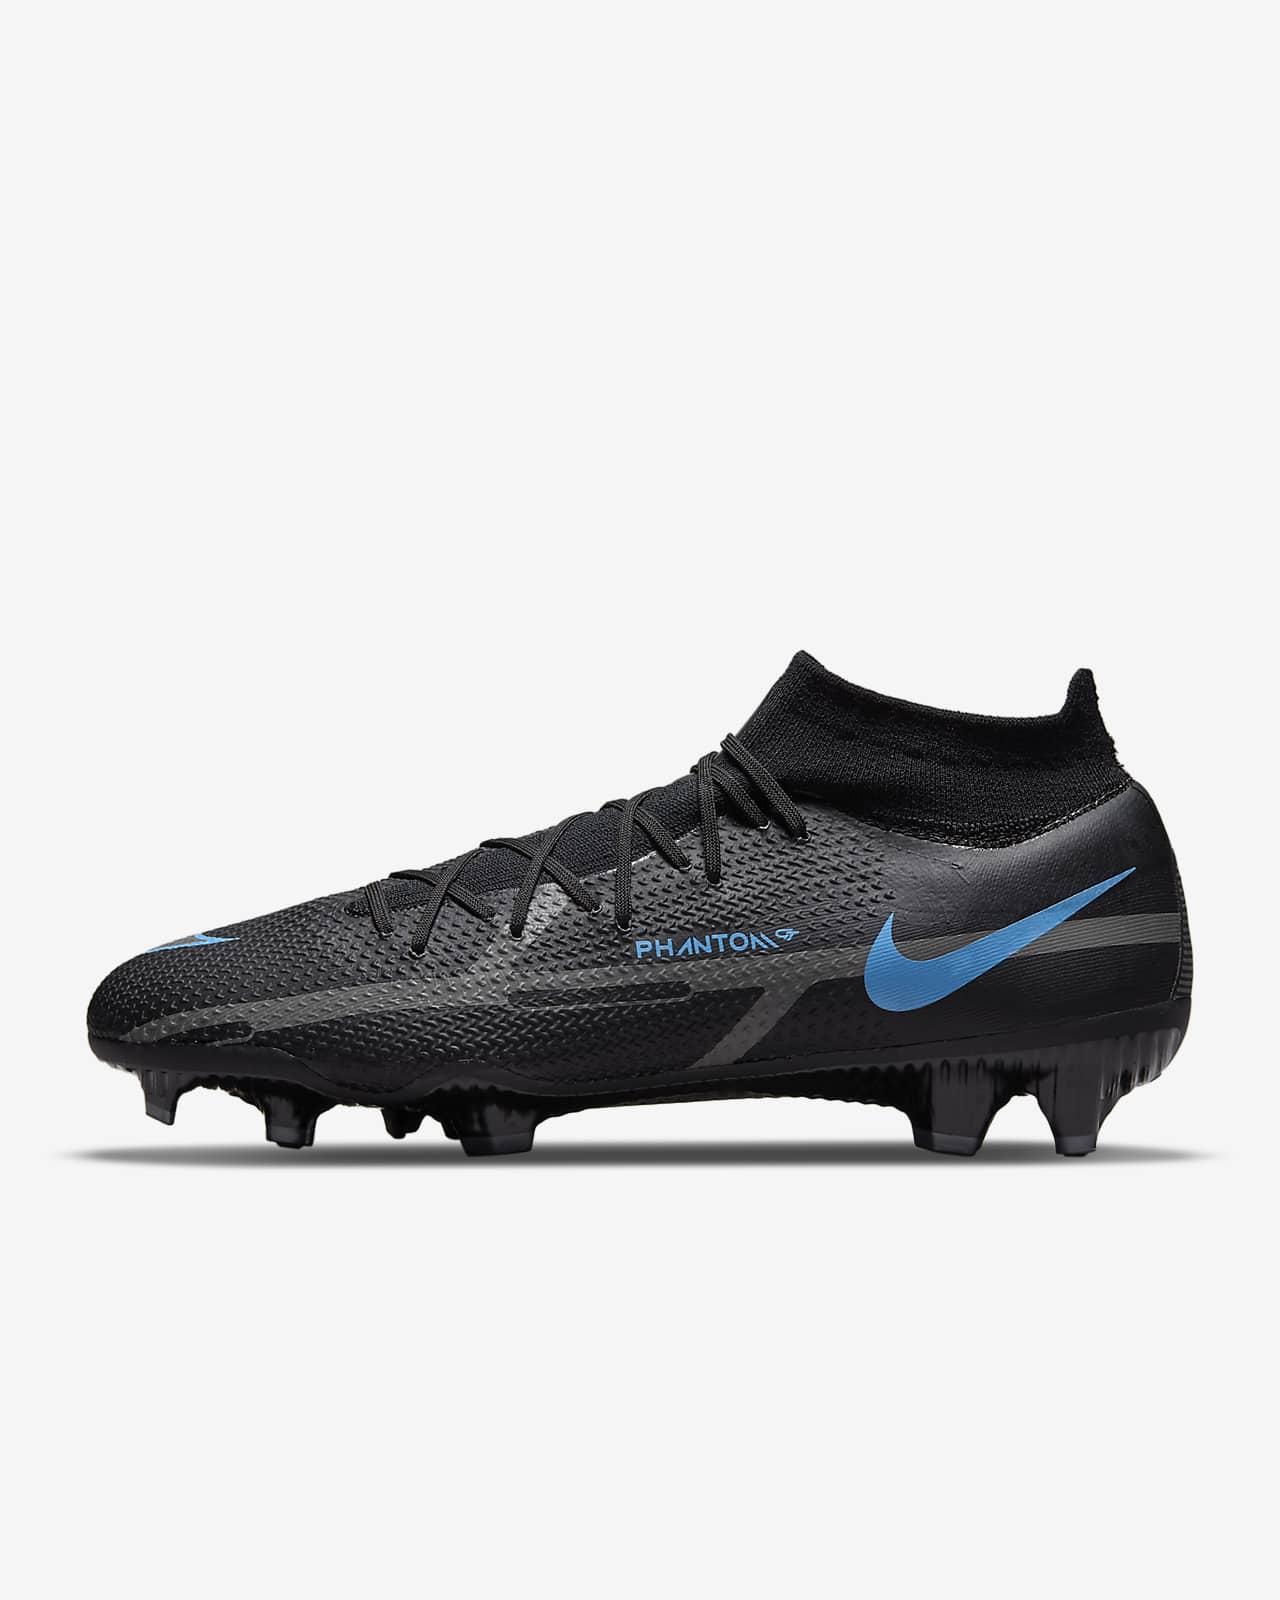 Calzado de fútbol para terreno firme Nike Phantom GT2 Pro Dynamic Fit FG